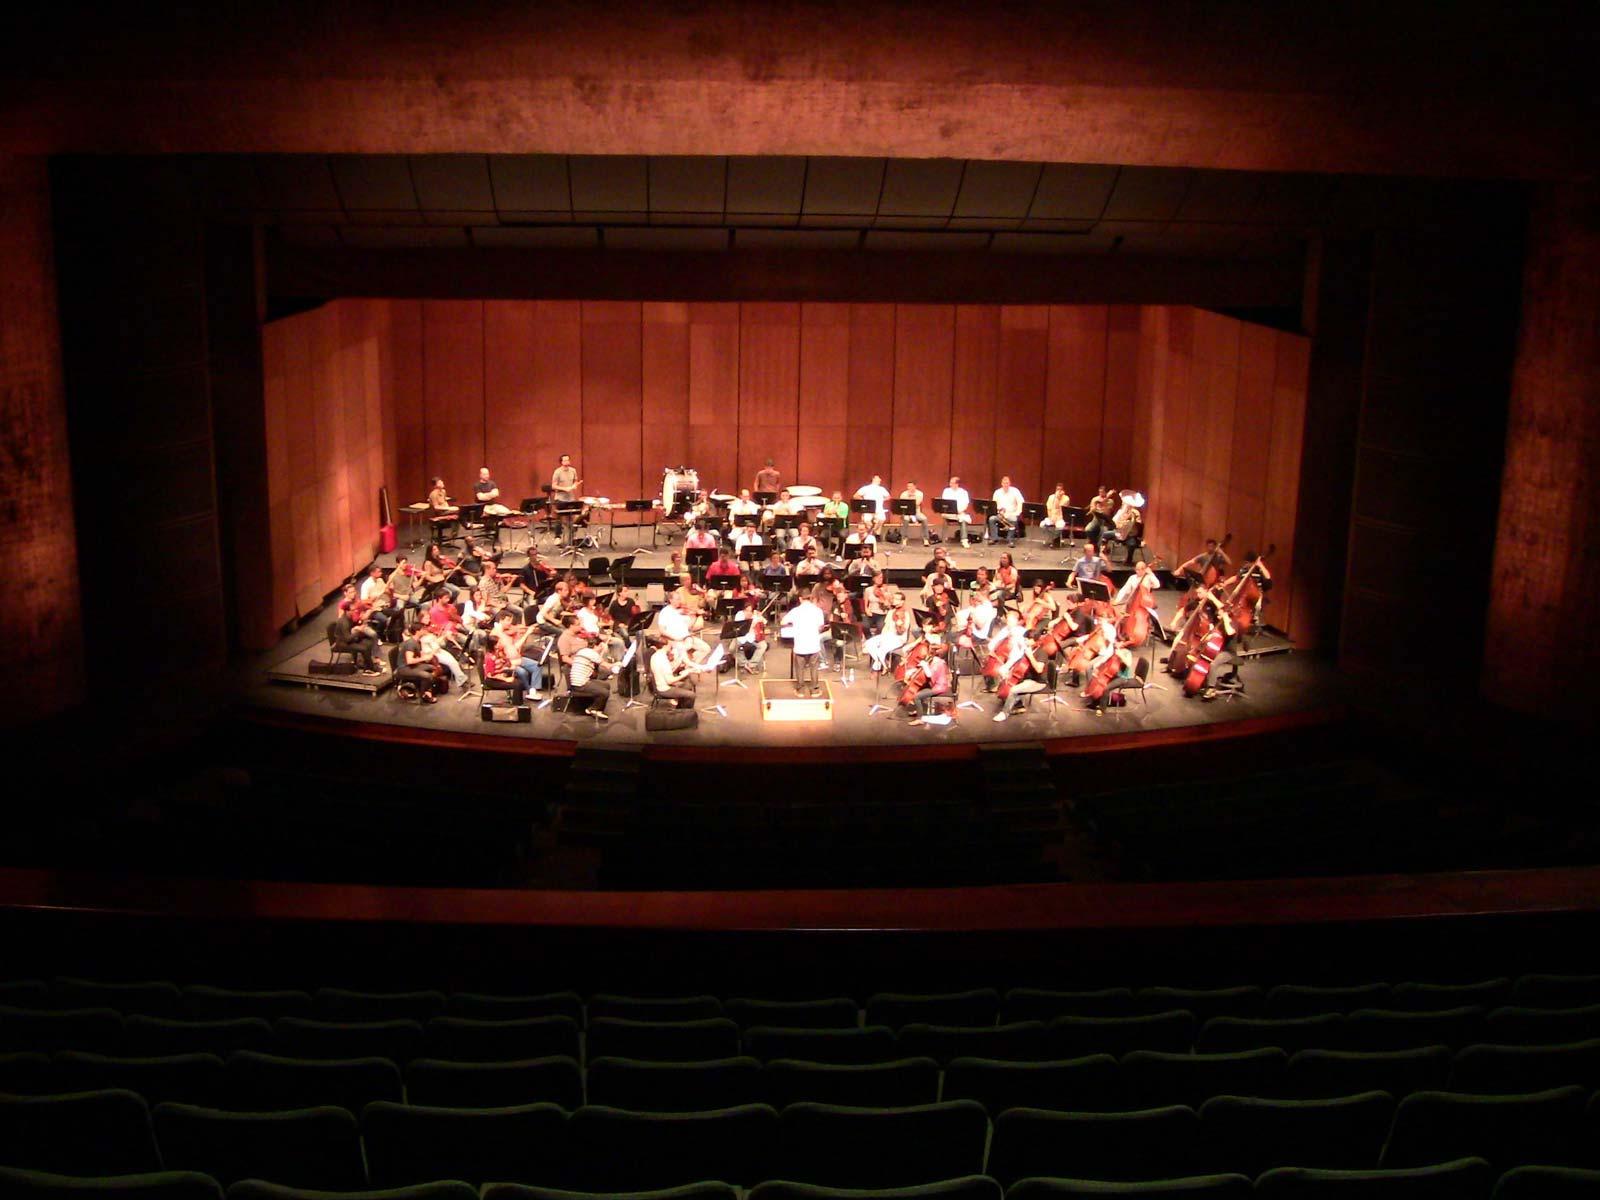 theater-musikprobe-belo-horizonte-palacio-das-artes